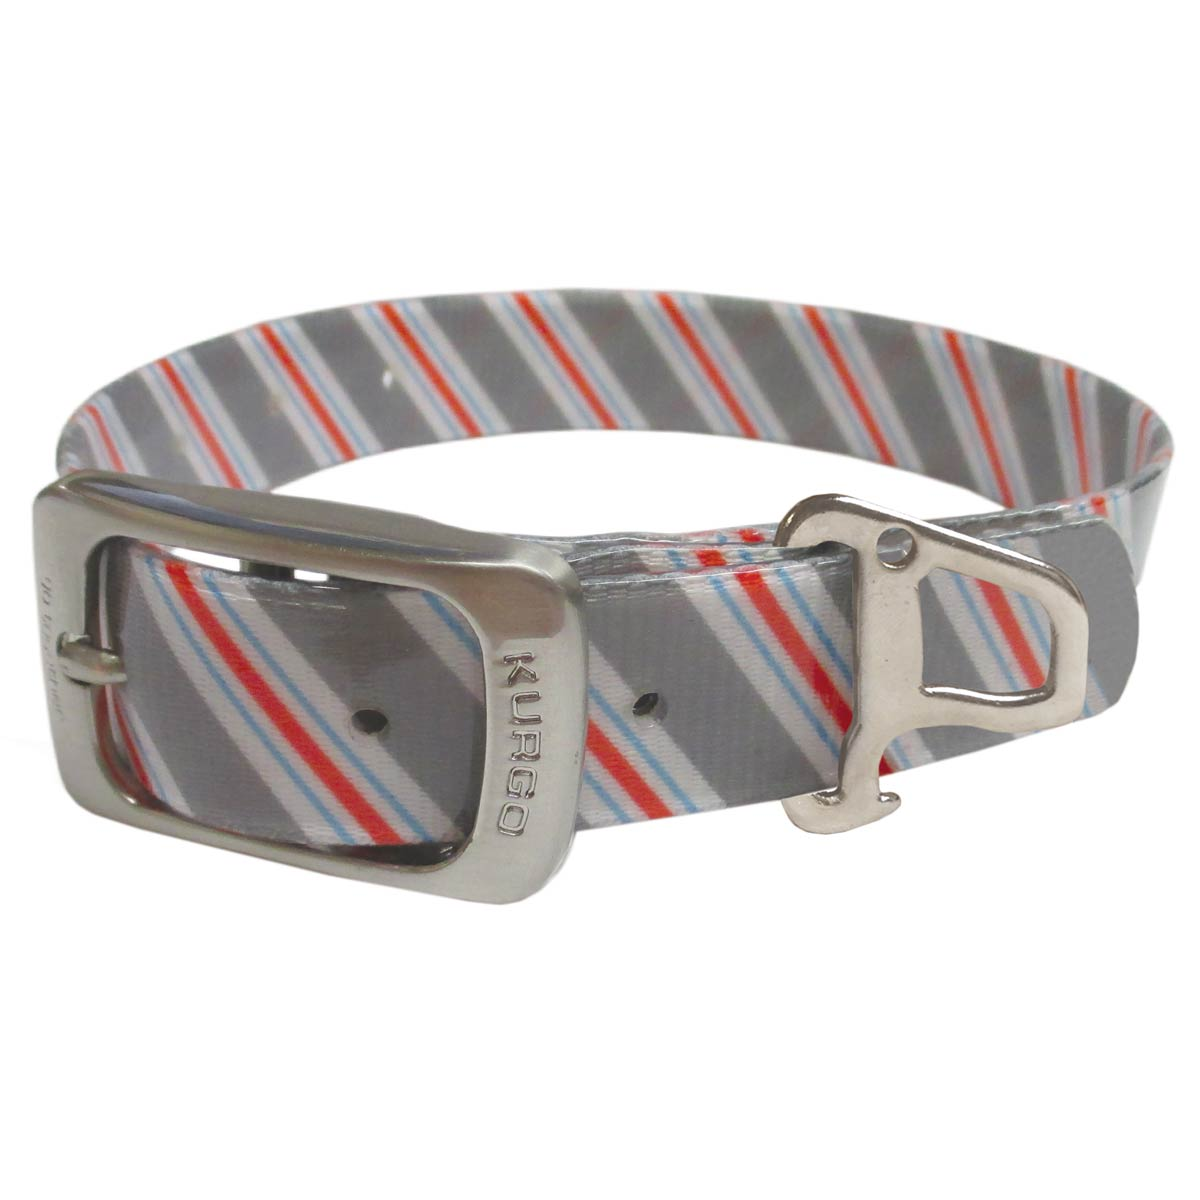 Muck Dog Collar by Kurgo - Prepster Stripe Granite Gray